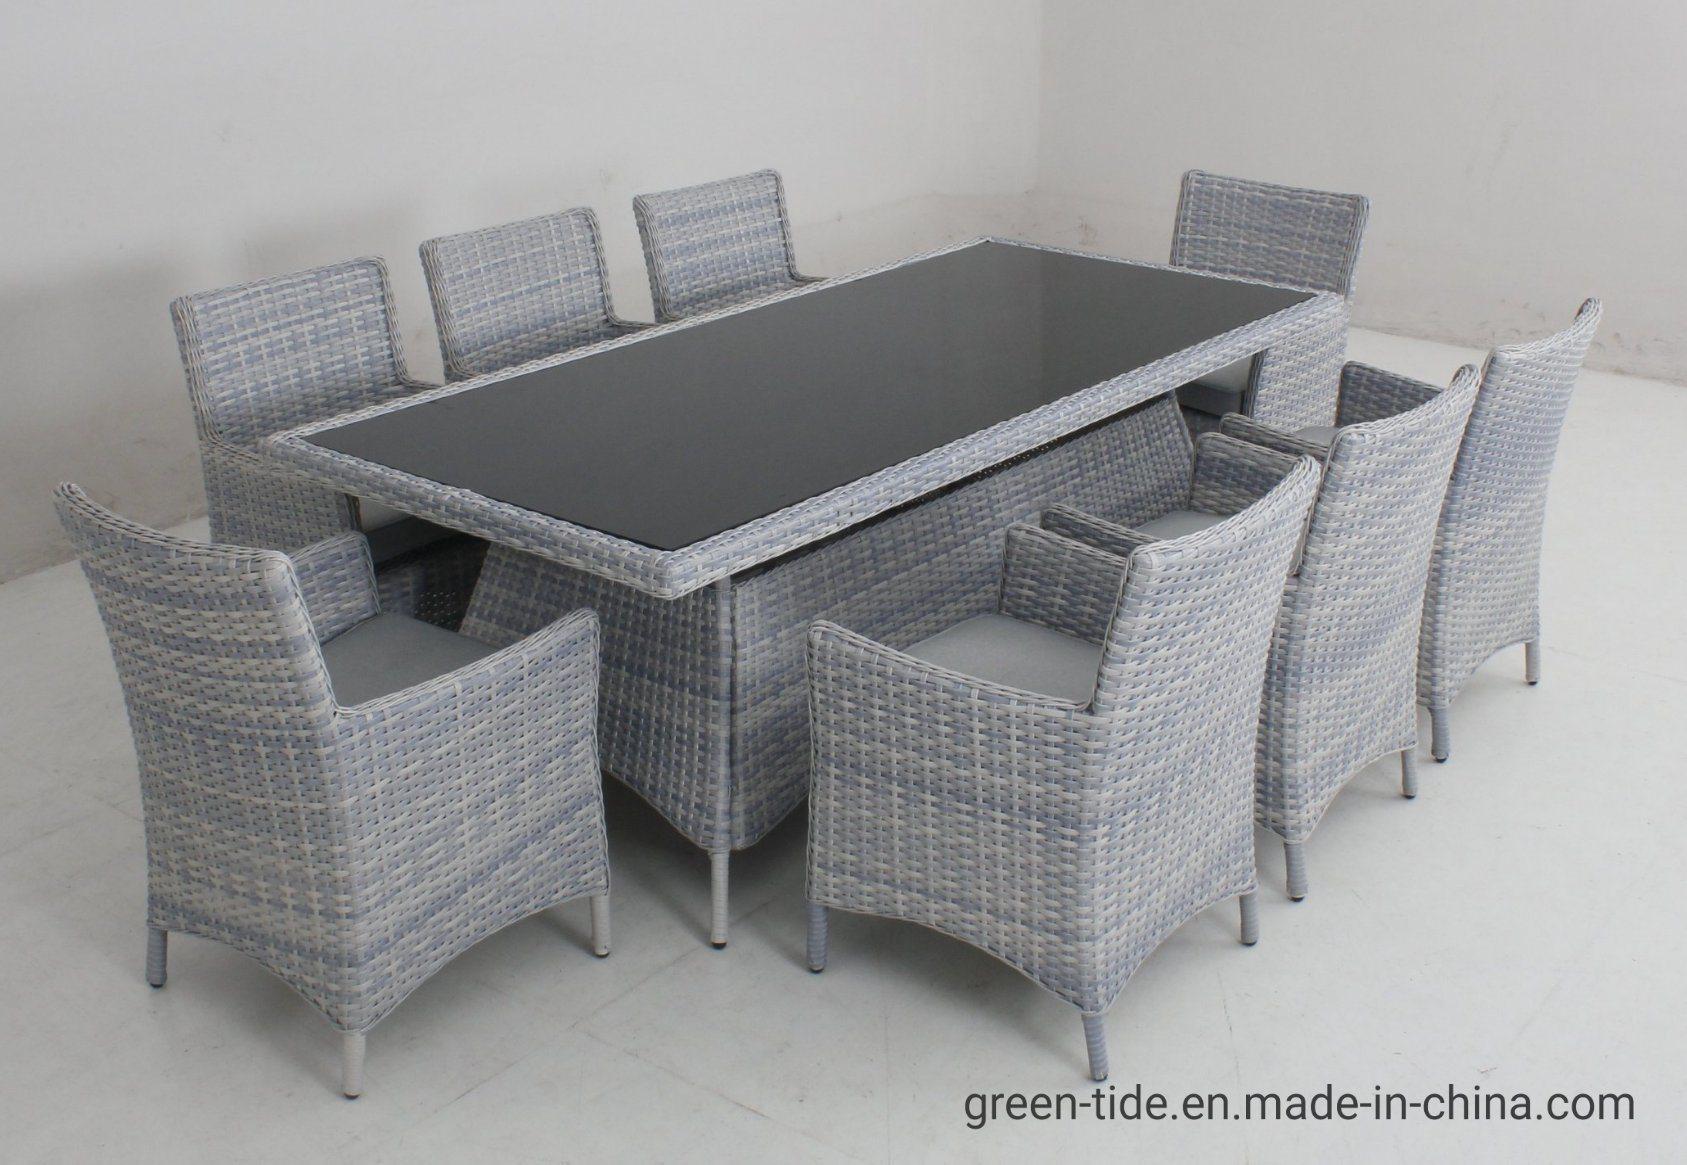 Chinese Outdoor Patio Furniture Garden